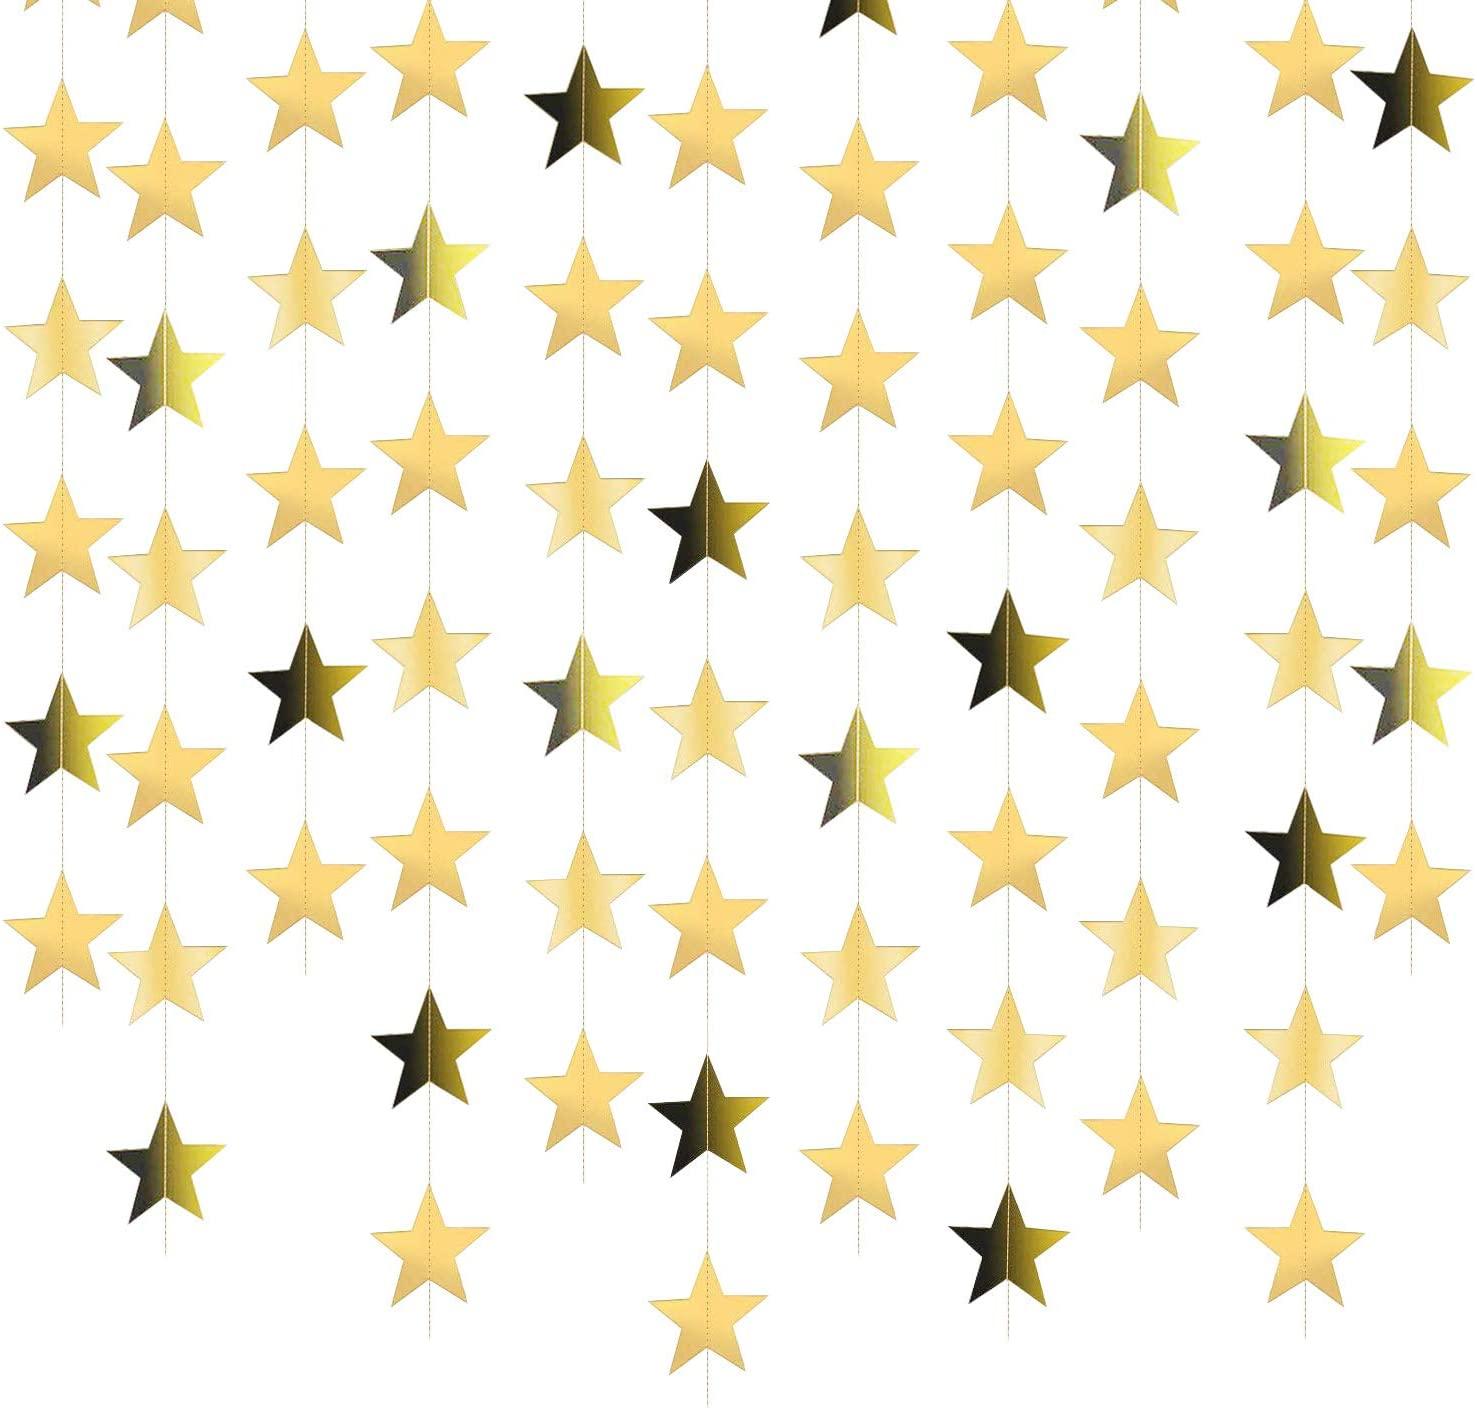 130 Feet Bright Gold Star Garland Banner Decorations Star Paper Garland Star Hanging Garland for Engagement or Wedding Party Birthday Christmas Decorations